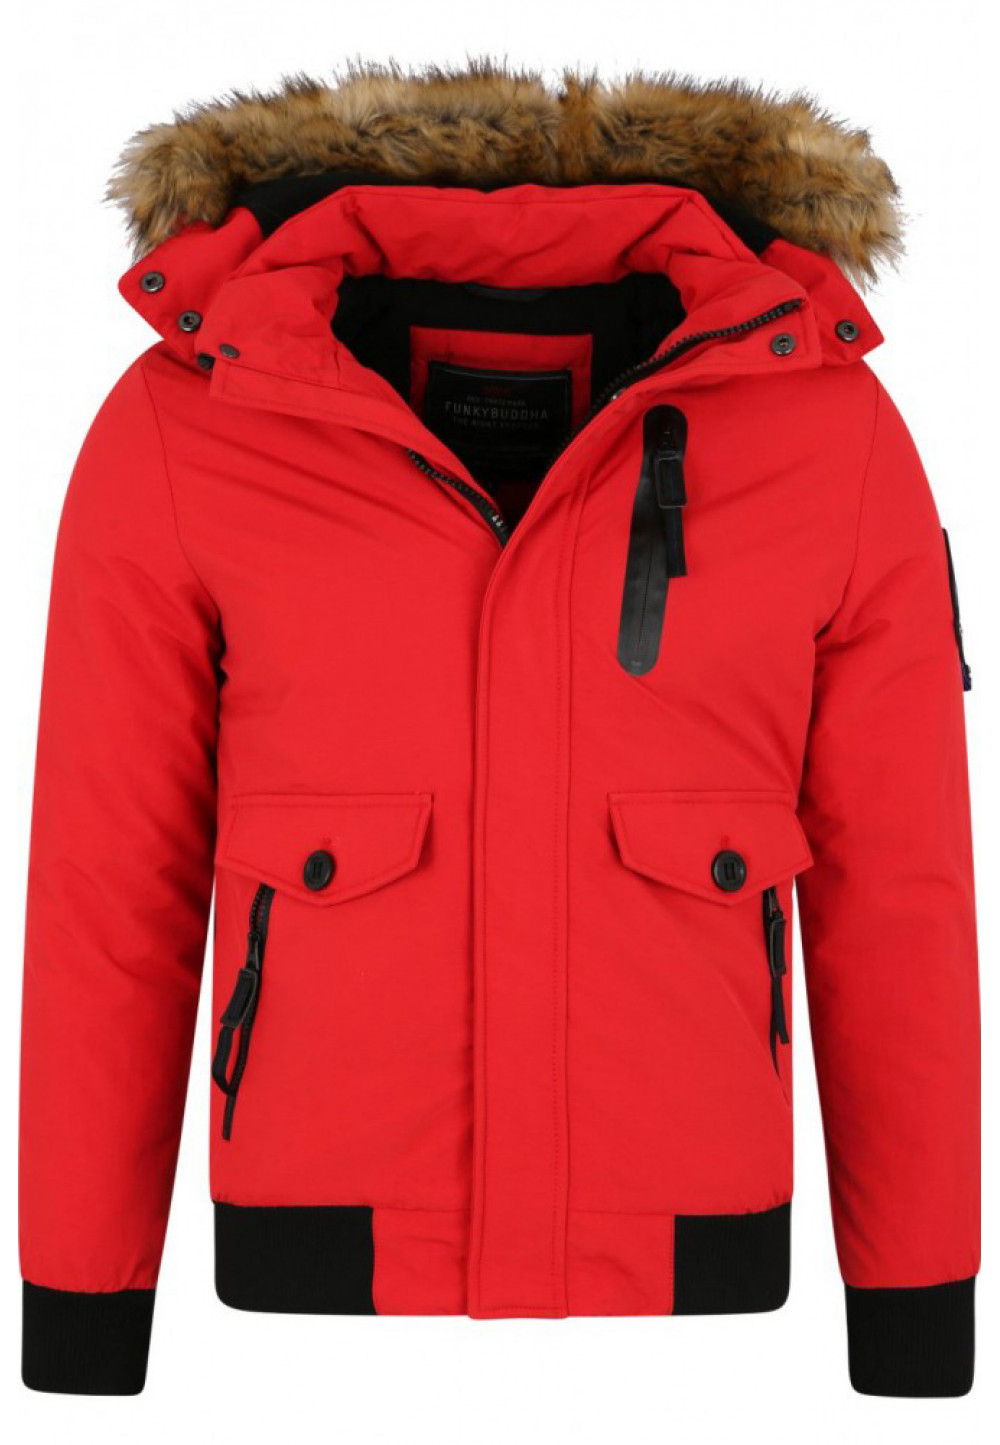 Красная куртка со съемным капюшоном